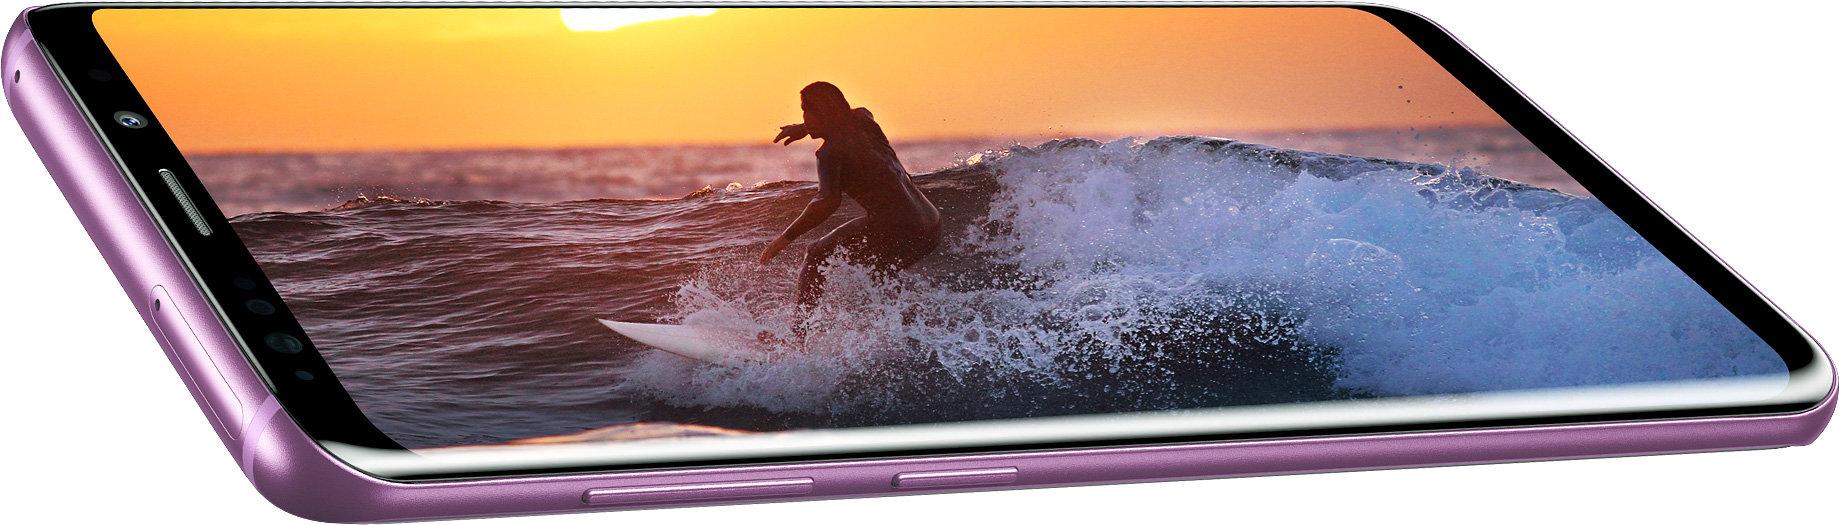 Nejdokonalejší Infinity displej si zamilujete, dokonalé barvy a špičkové pozorovací úhly - Galaxy S9